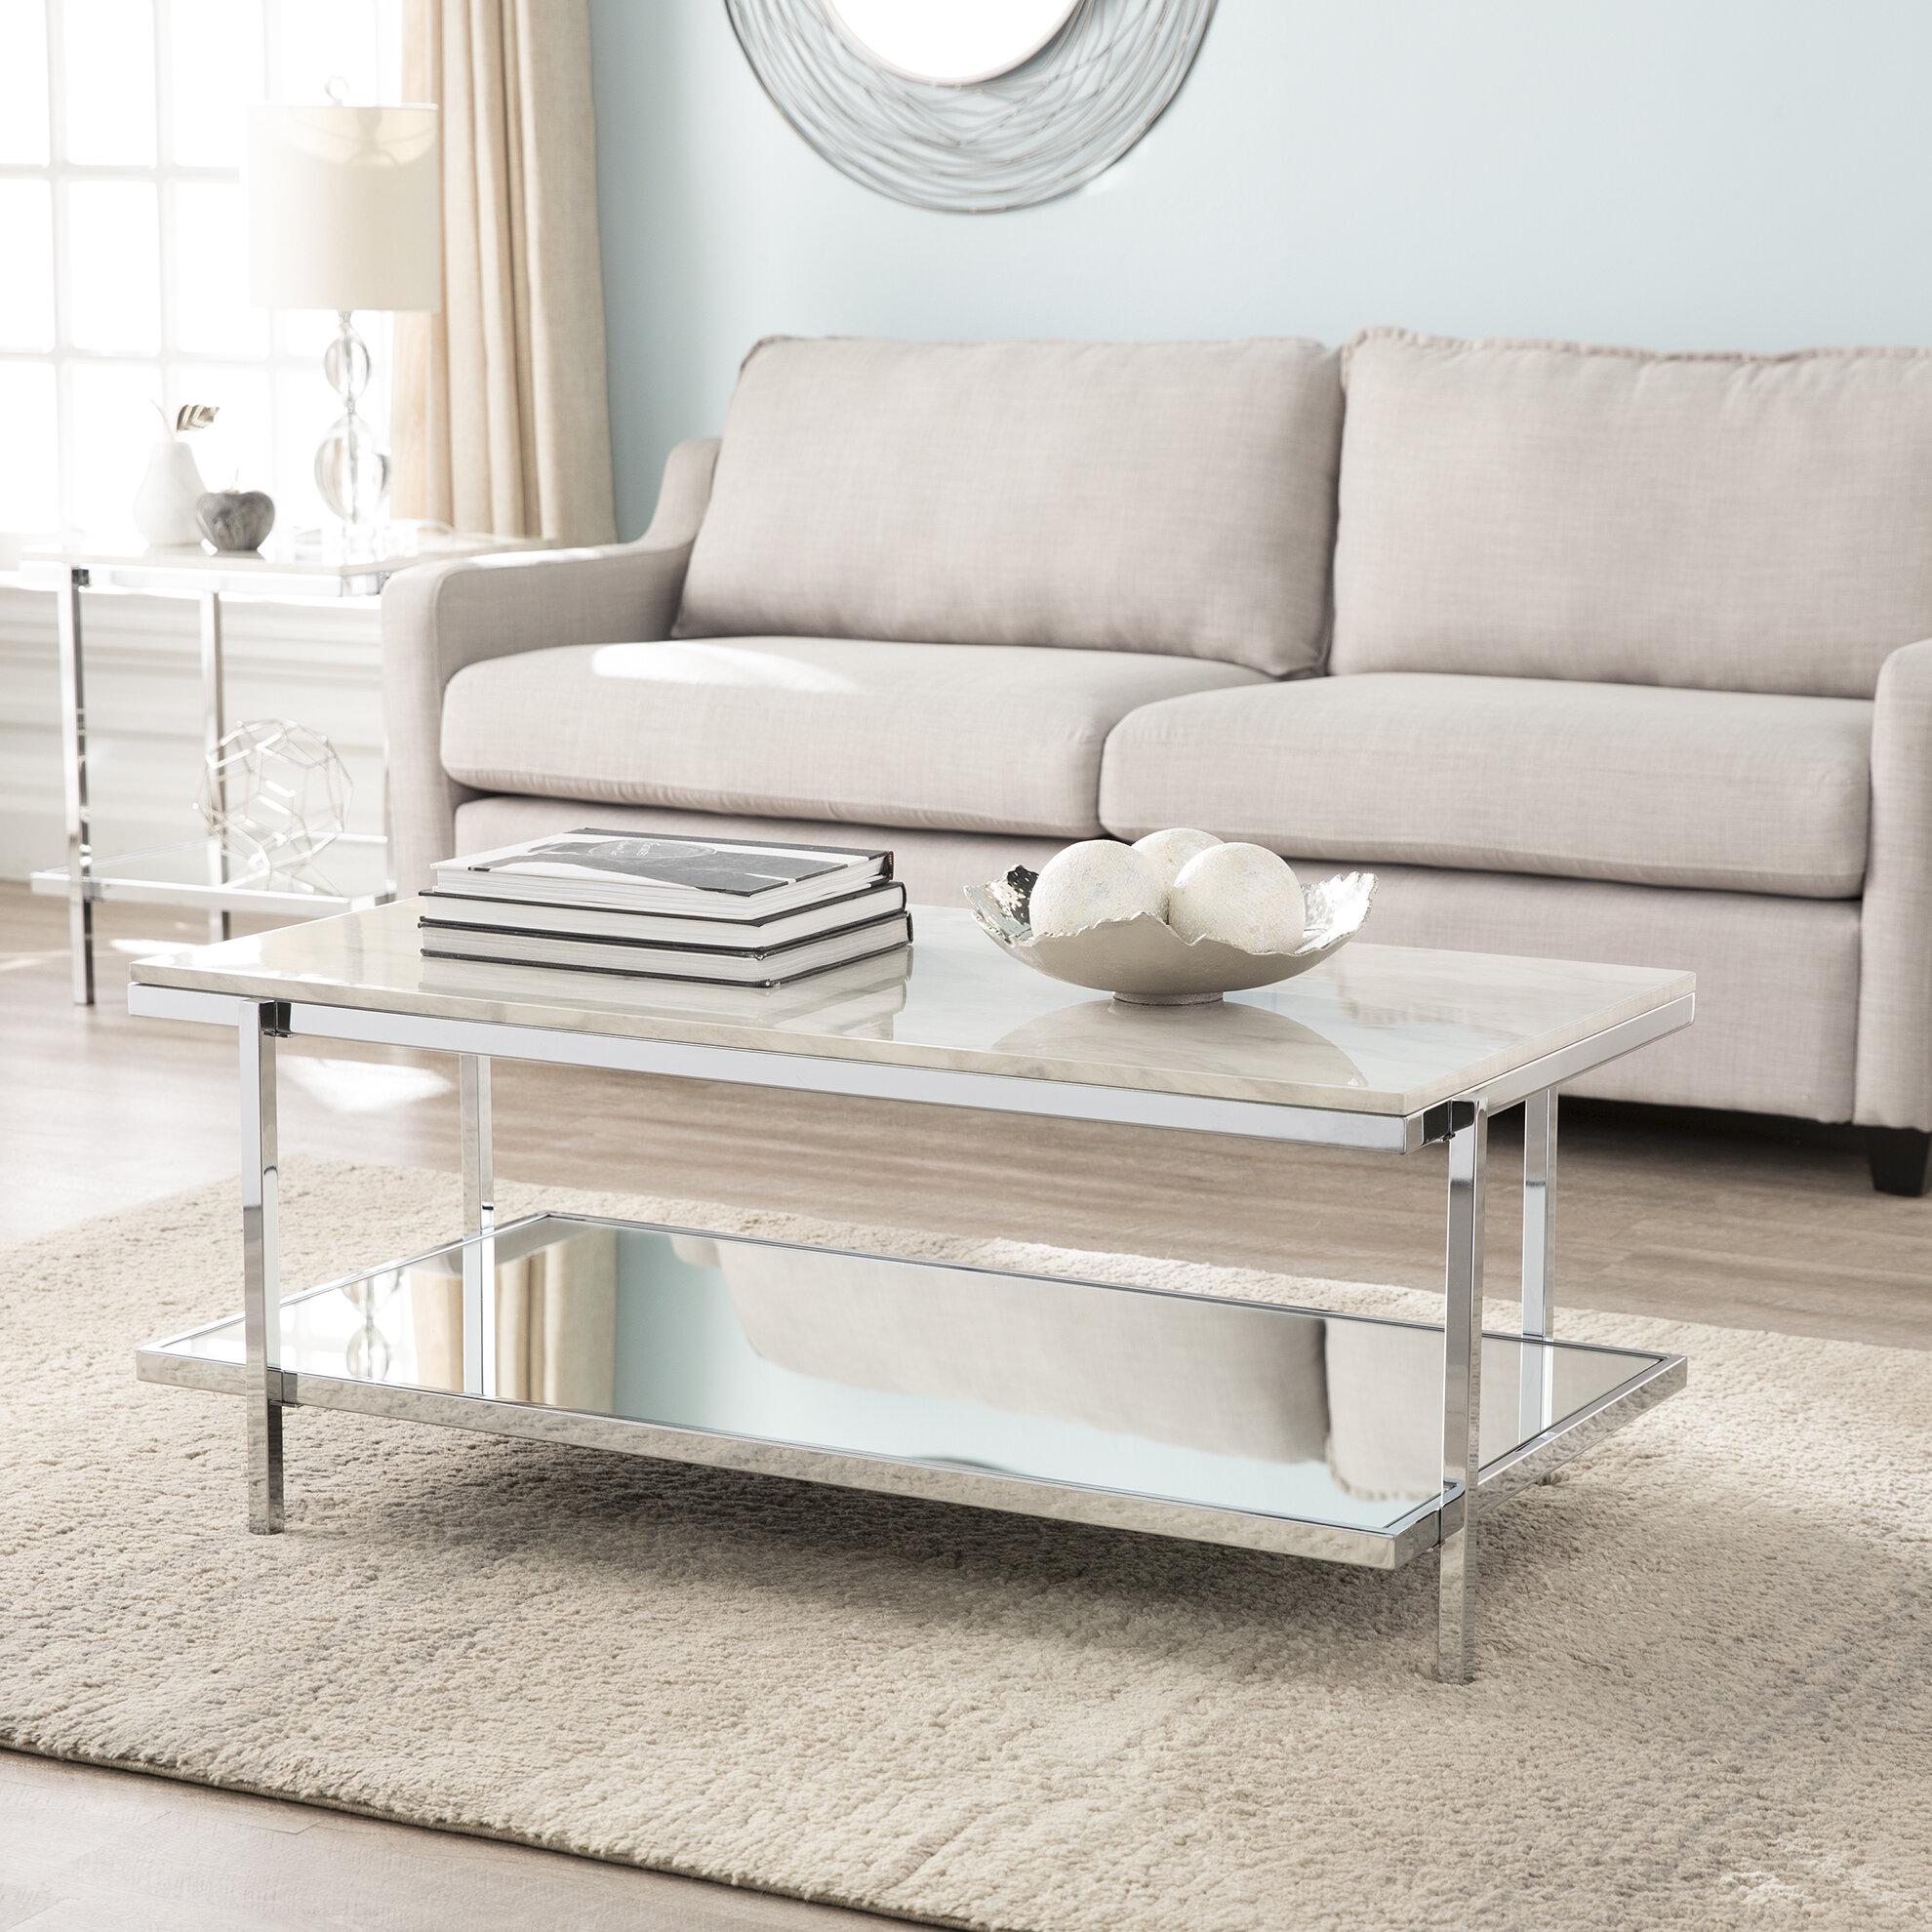 Merveilleux Everly Quinn Skipton Faux Marble 2 Piece Coffee Table Set | Wayfair